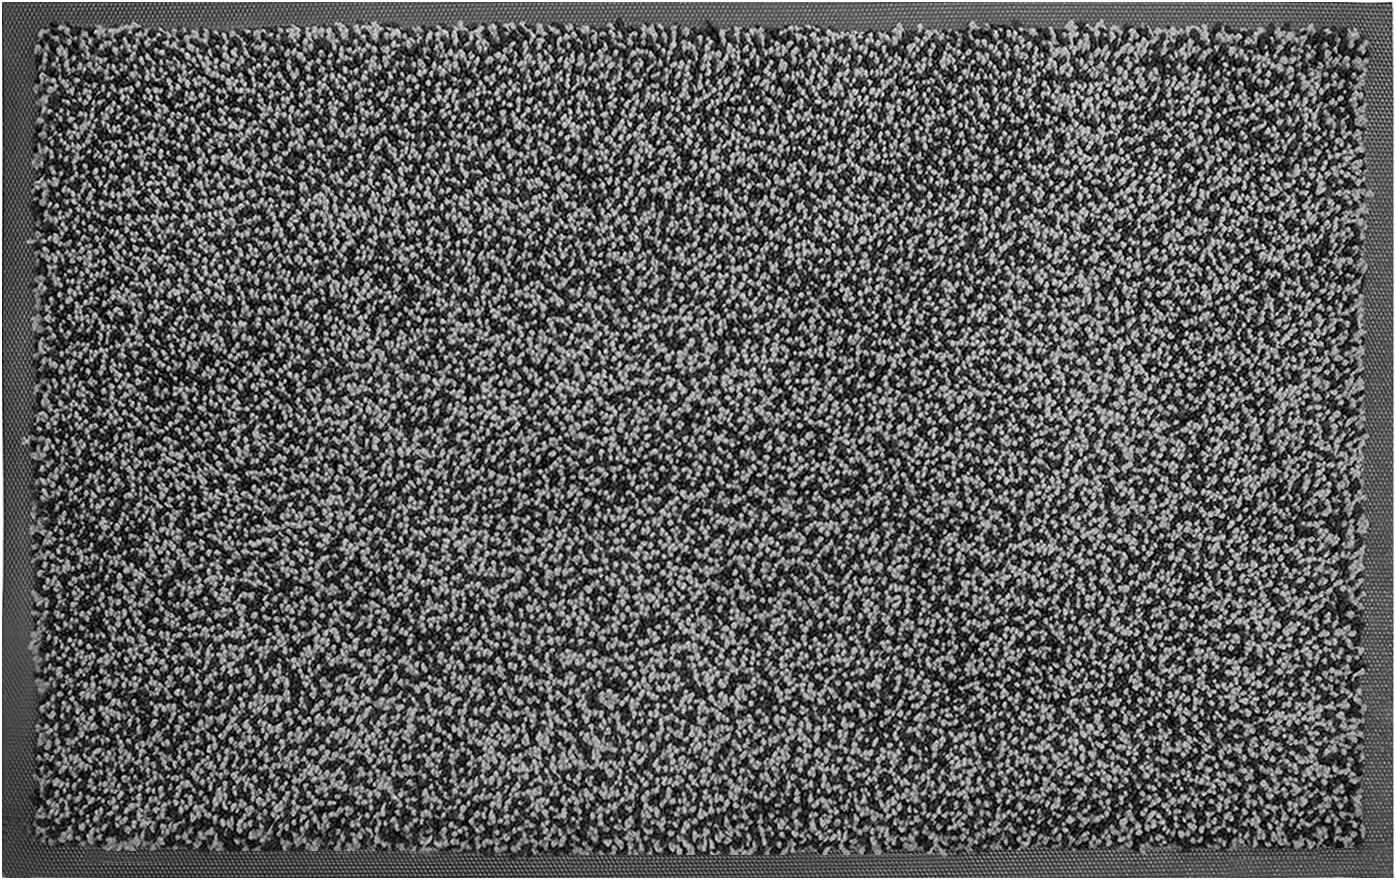 "MATALL Home Entrance Door Mat - Microfiber Super Absorbent Mat Floor Mats with Durable Rubber Backing Indoor Outdoor Low-Profile Doormats for House High Traffic Areas (35""x23.5"", Black&Grey )"